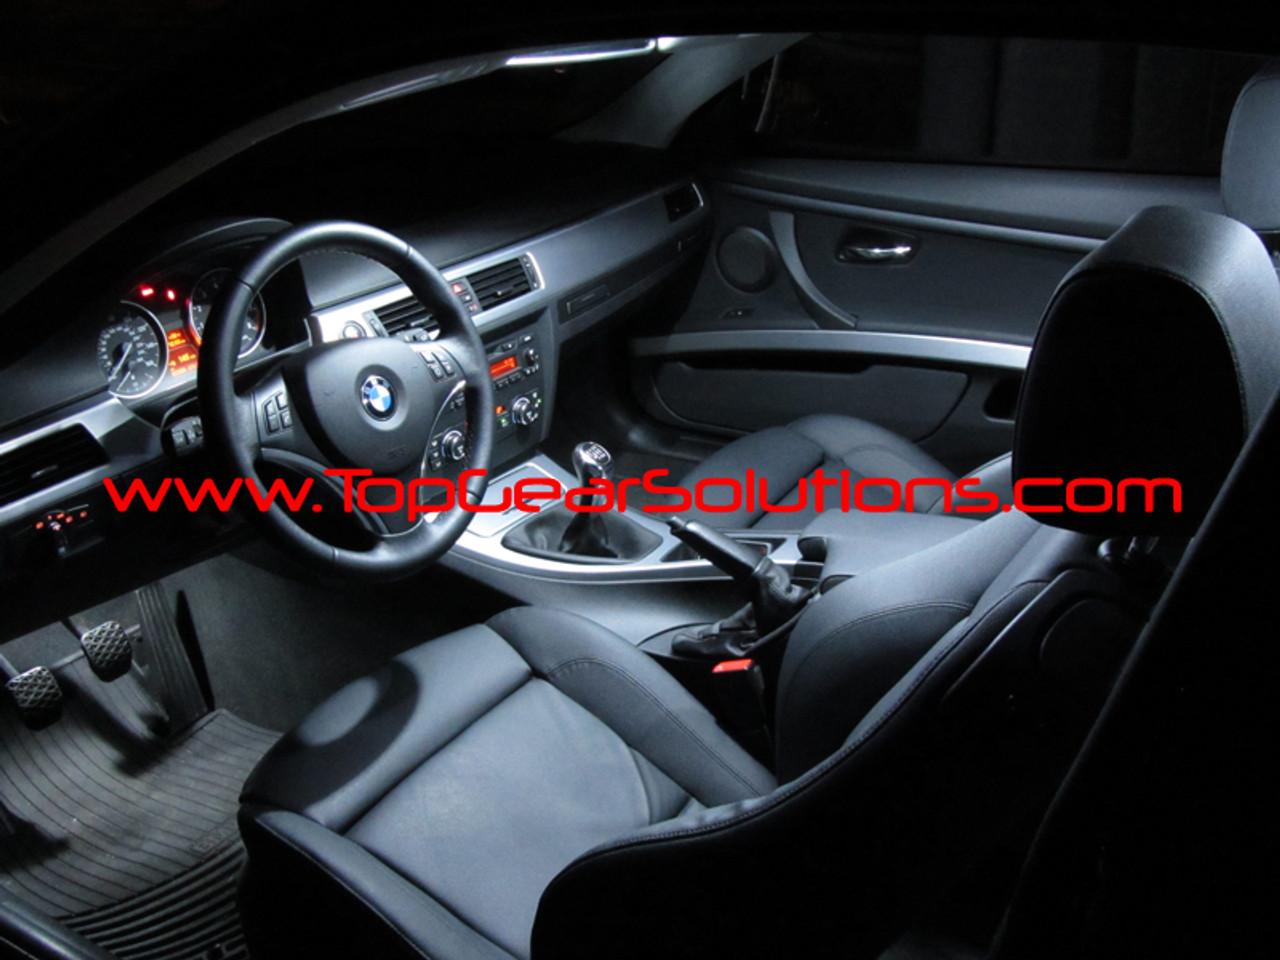 HPB LED Interior Kit Stage 3 (Max Output), BMW E90 / E92 *